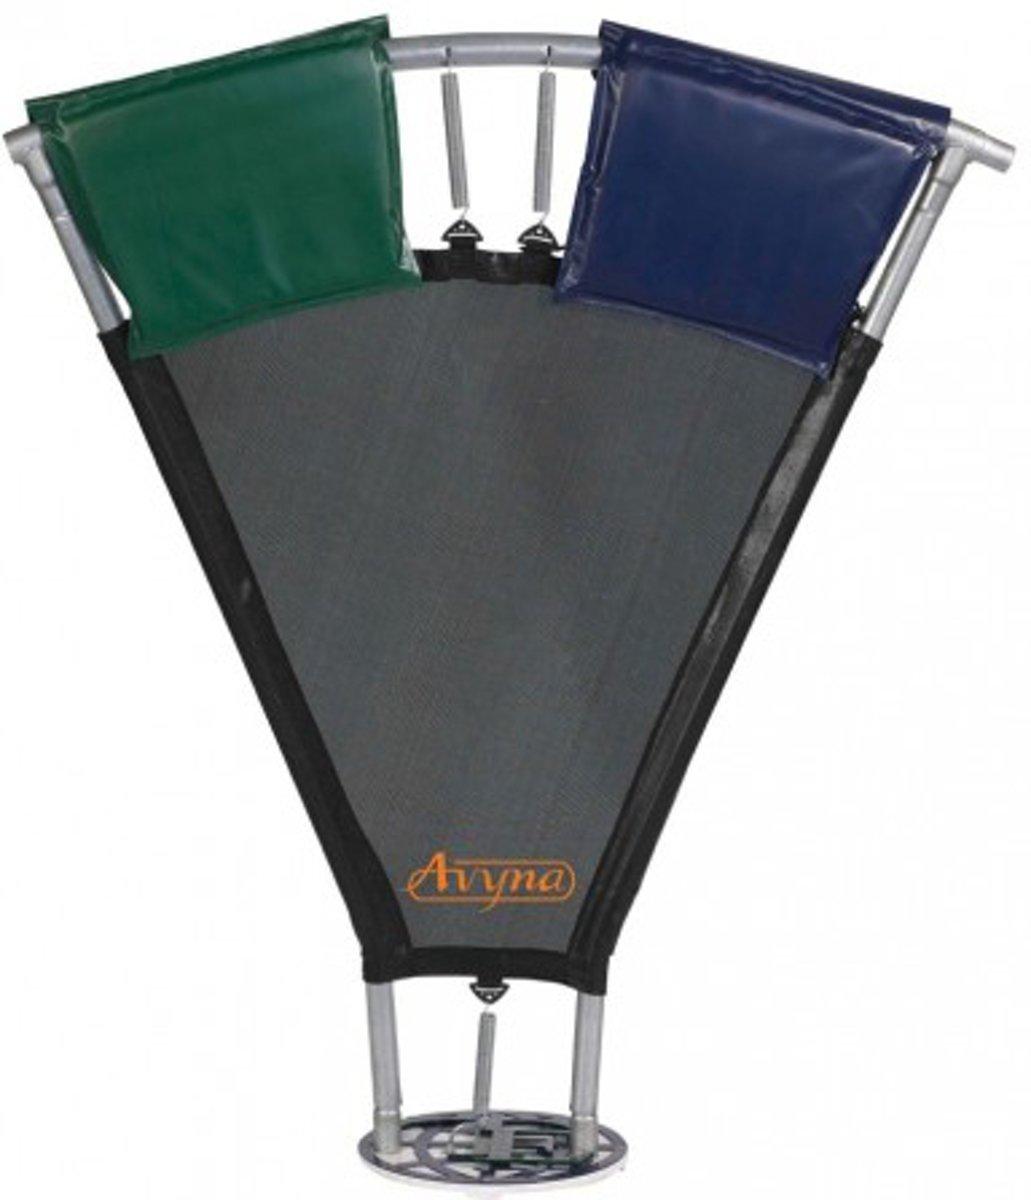 Avyna Springmat tbv PRO-LINE trampoline 4,30 (14 ft)